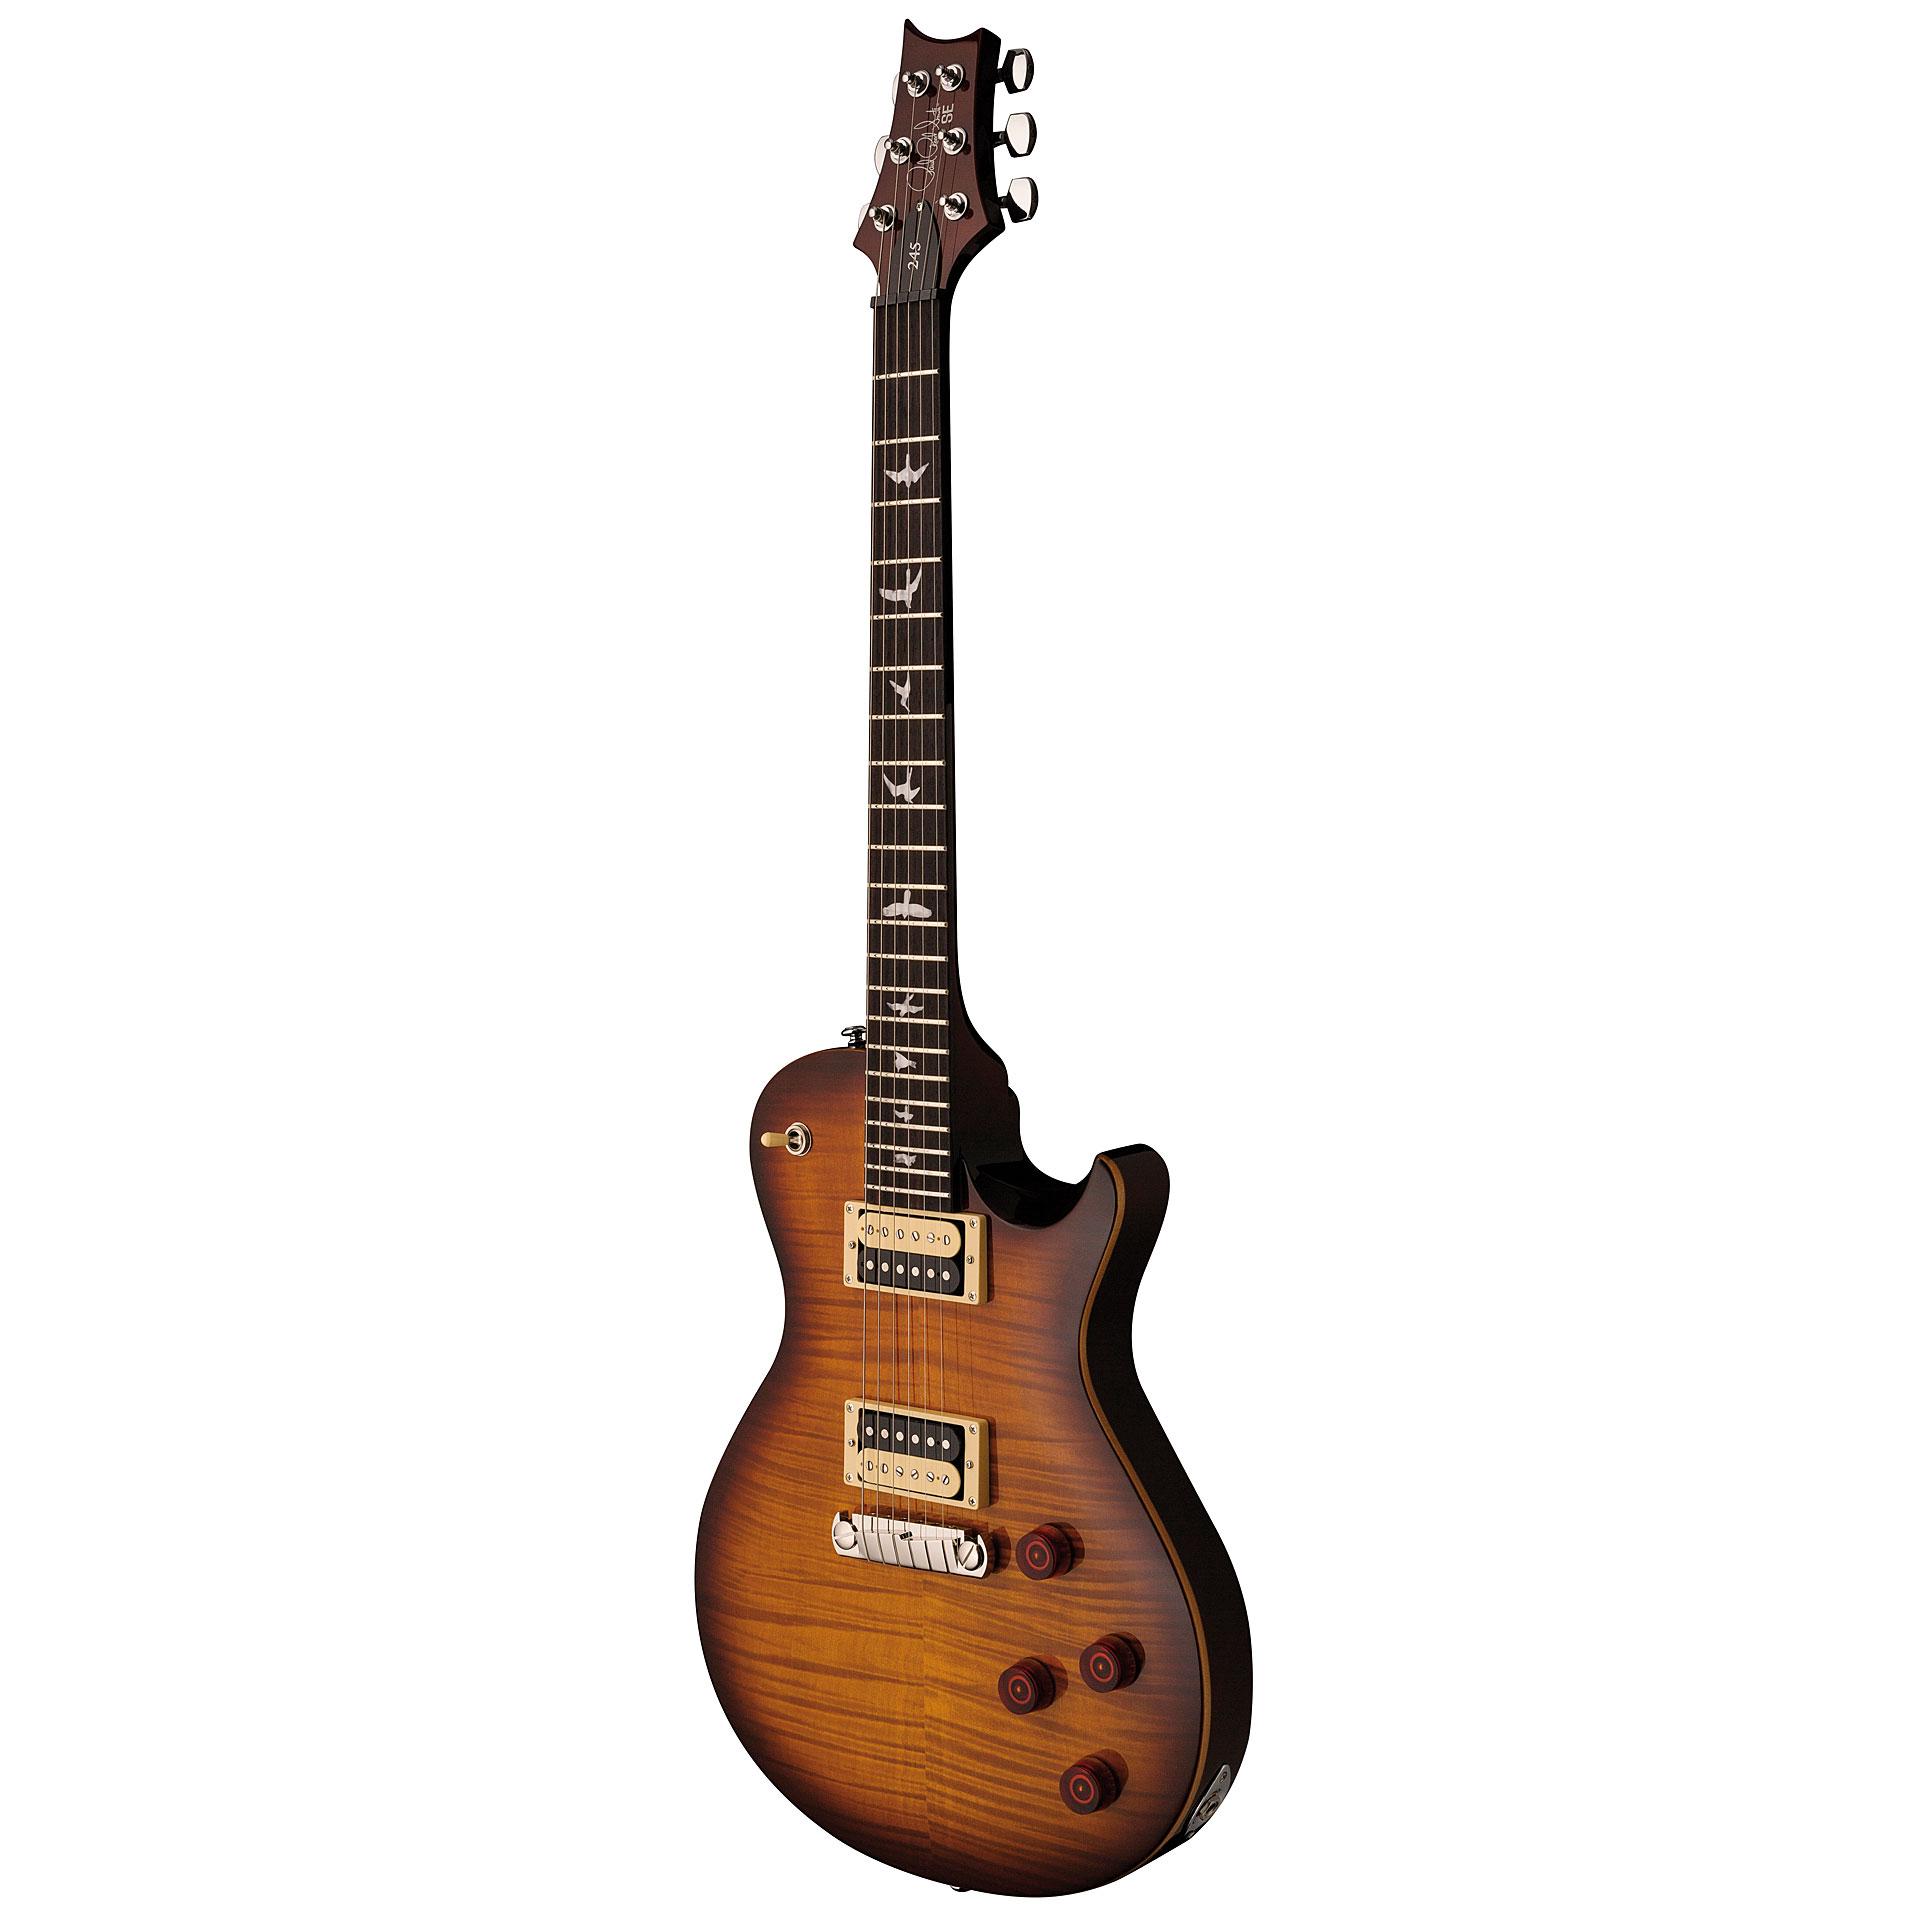 prs se 245 singlecut ts electric guitar musik produktiv. Black Bedroom Furniture Sets. Home Design Ideas